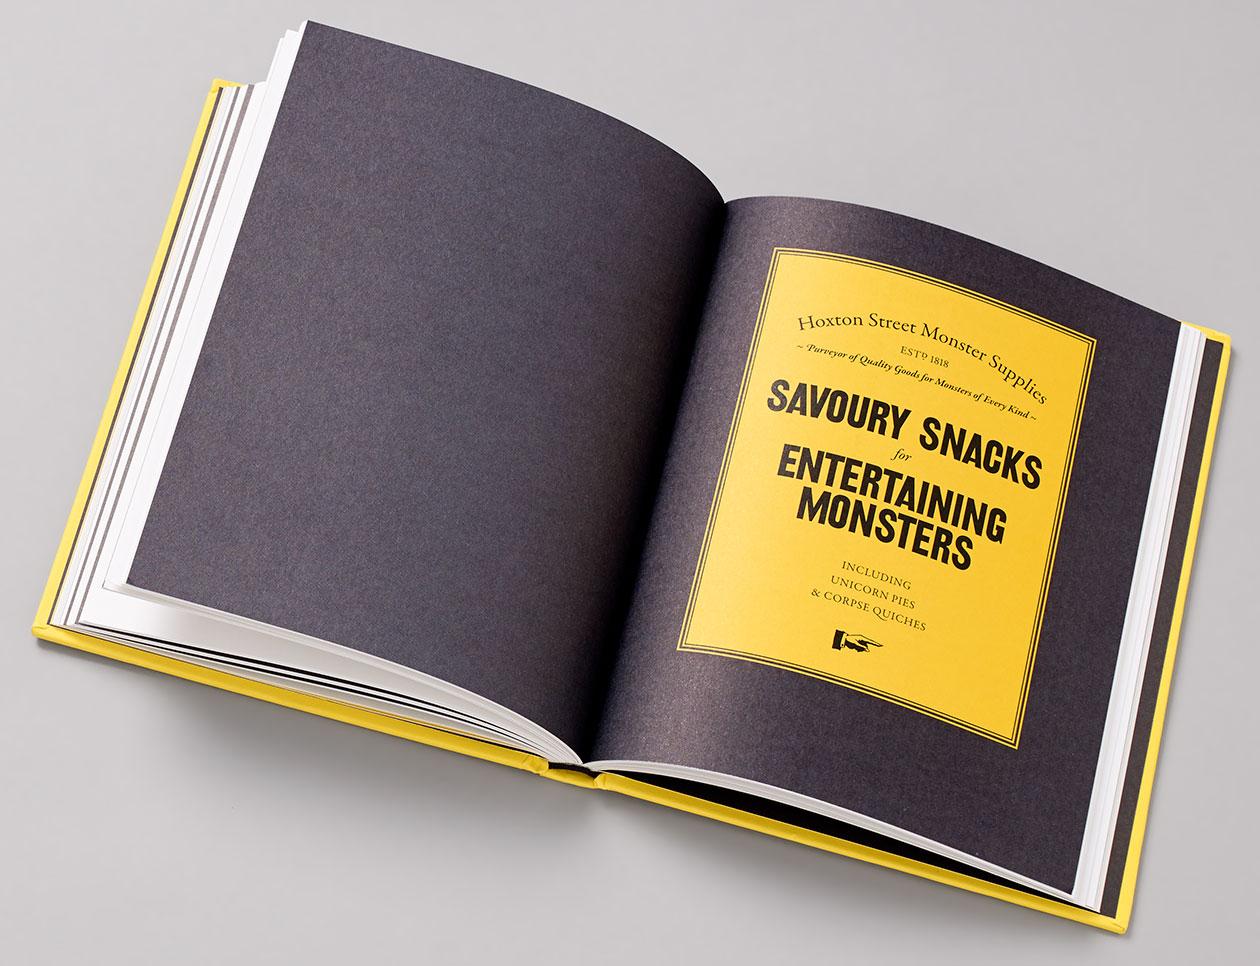 hsms_cookbook_spreads_108-109